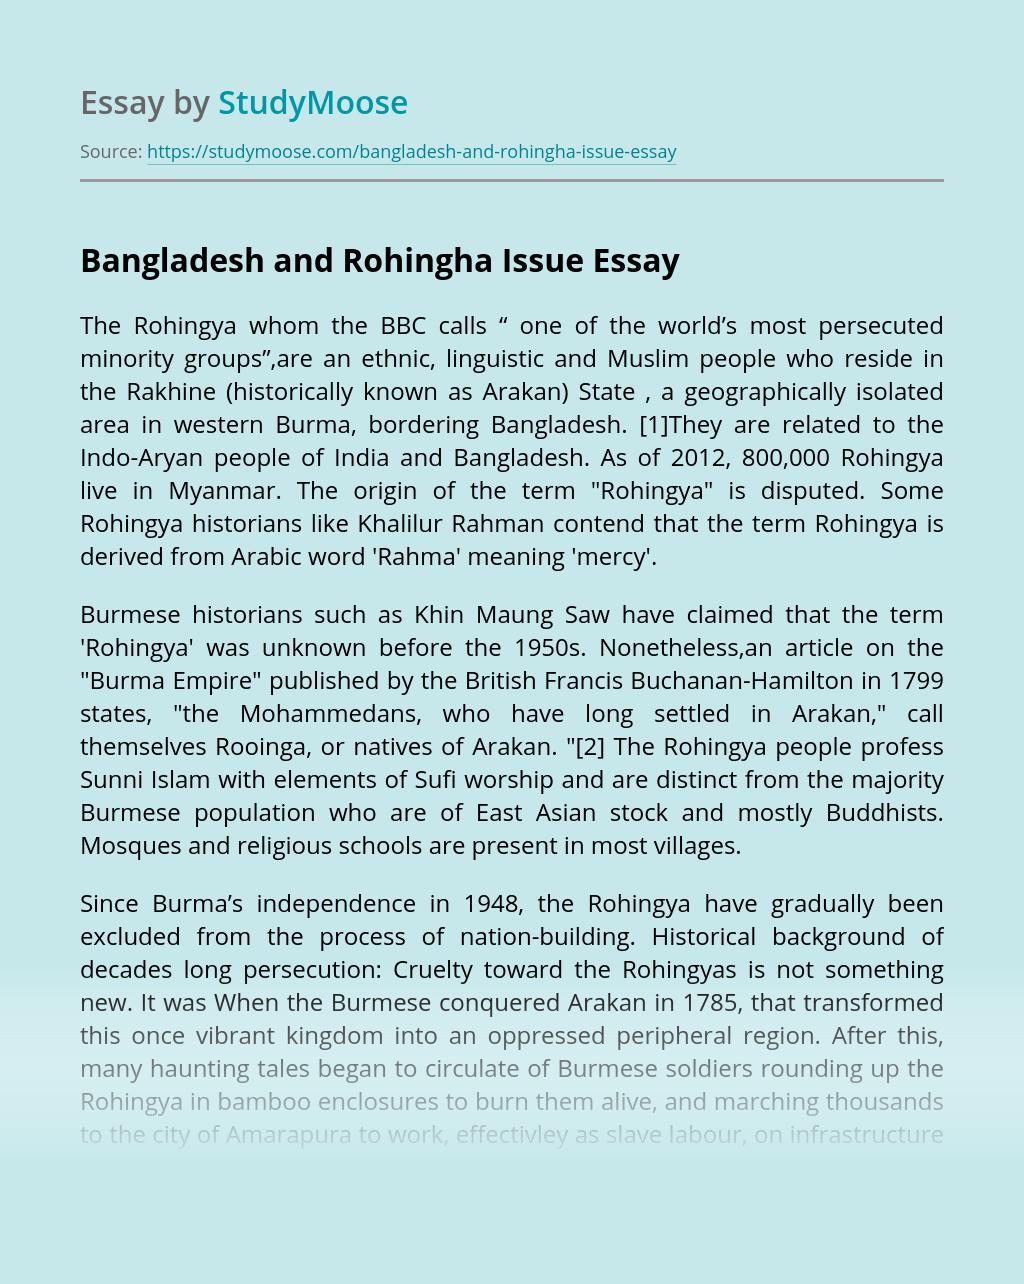 Bangladesh and Rohingha Issue